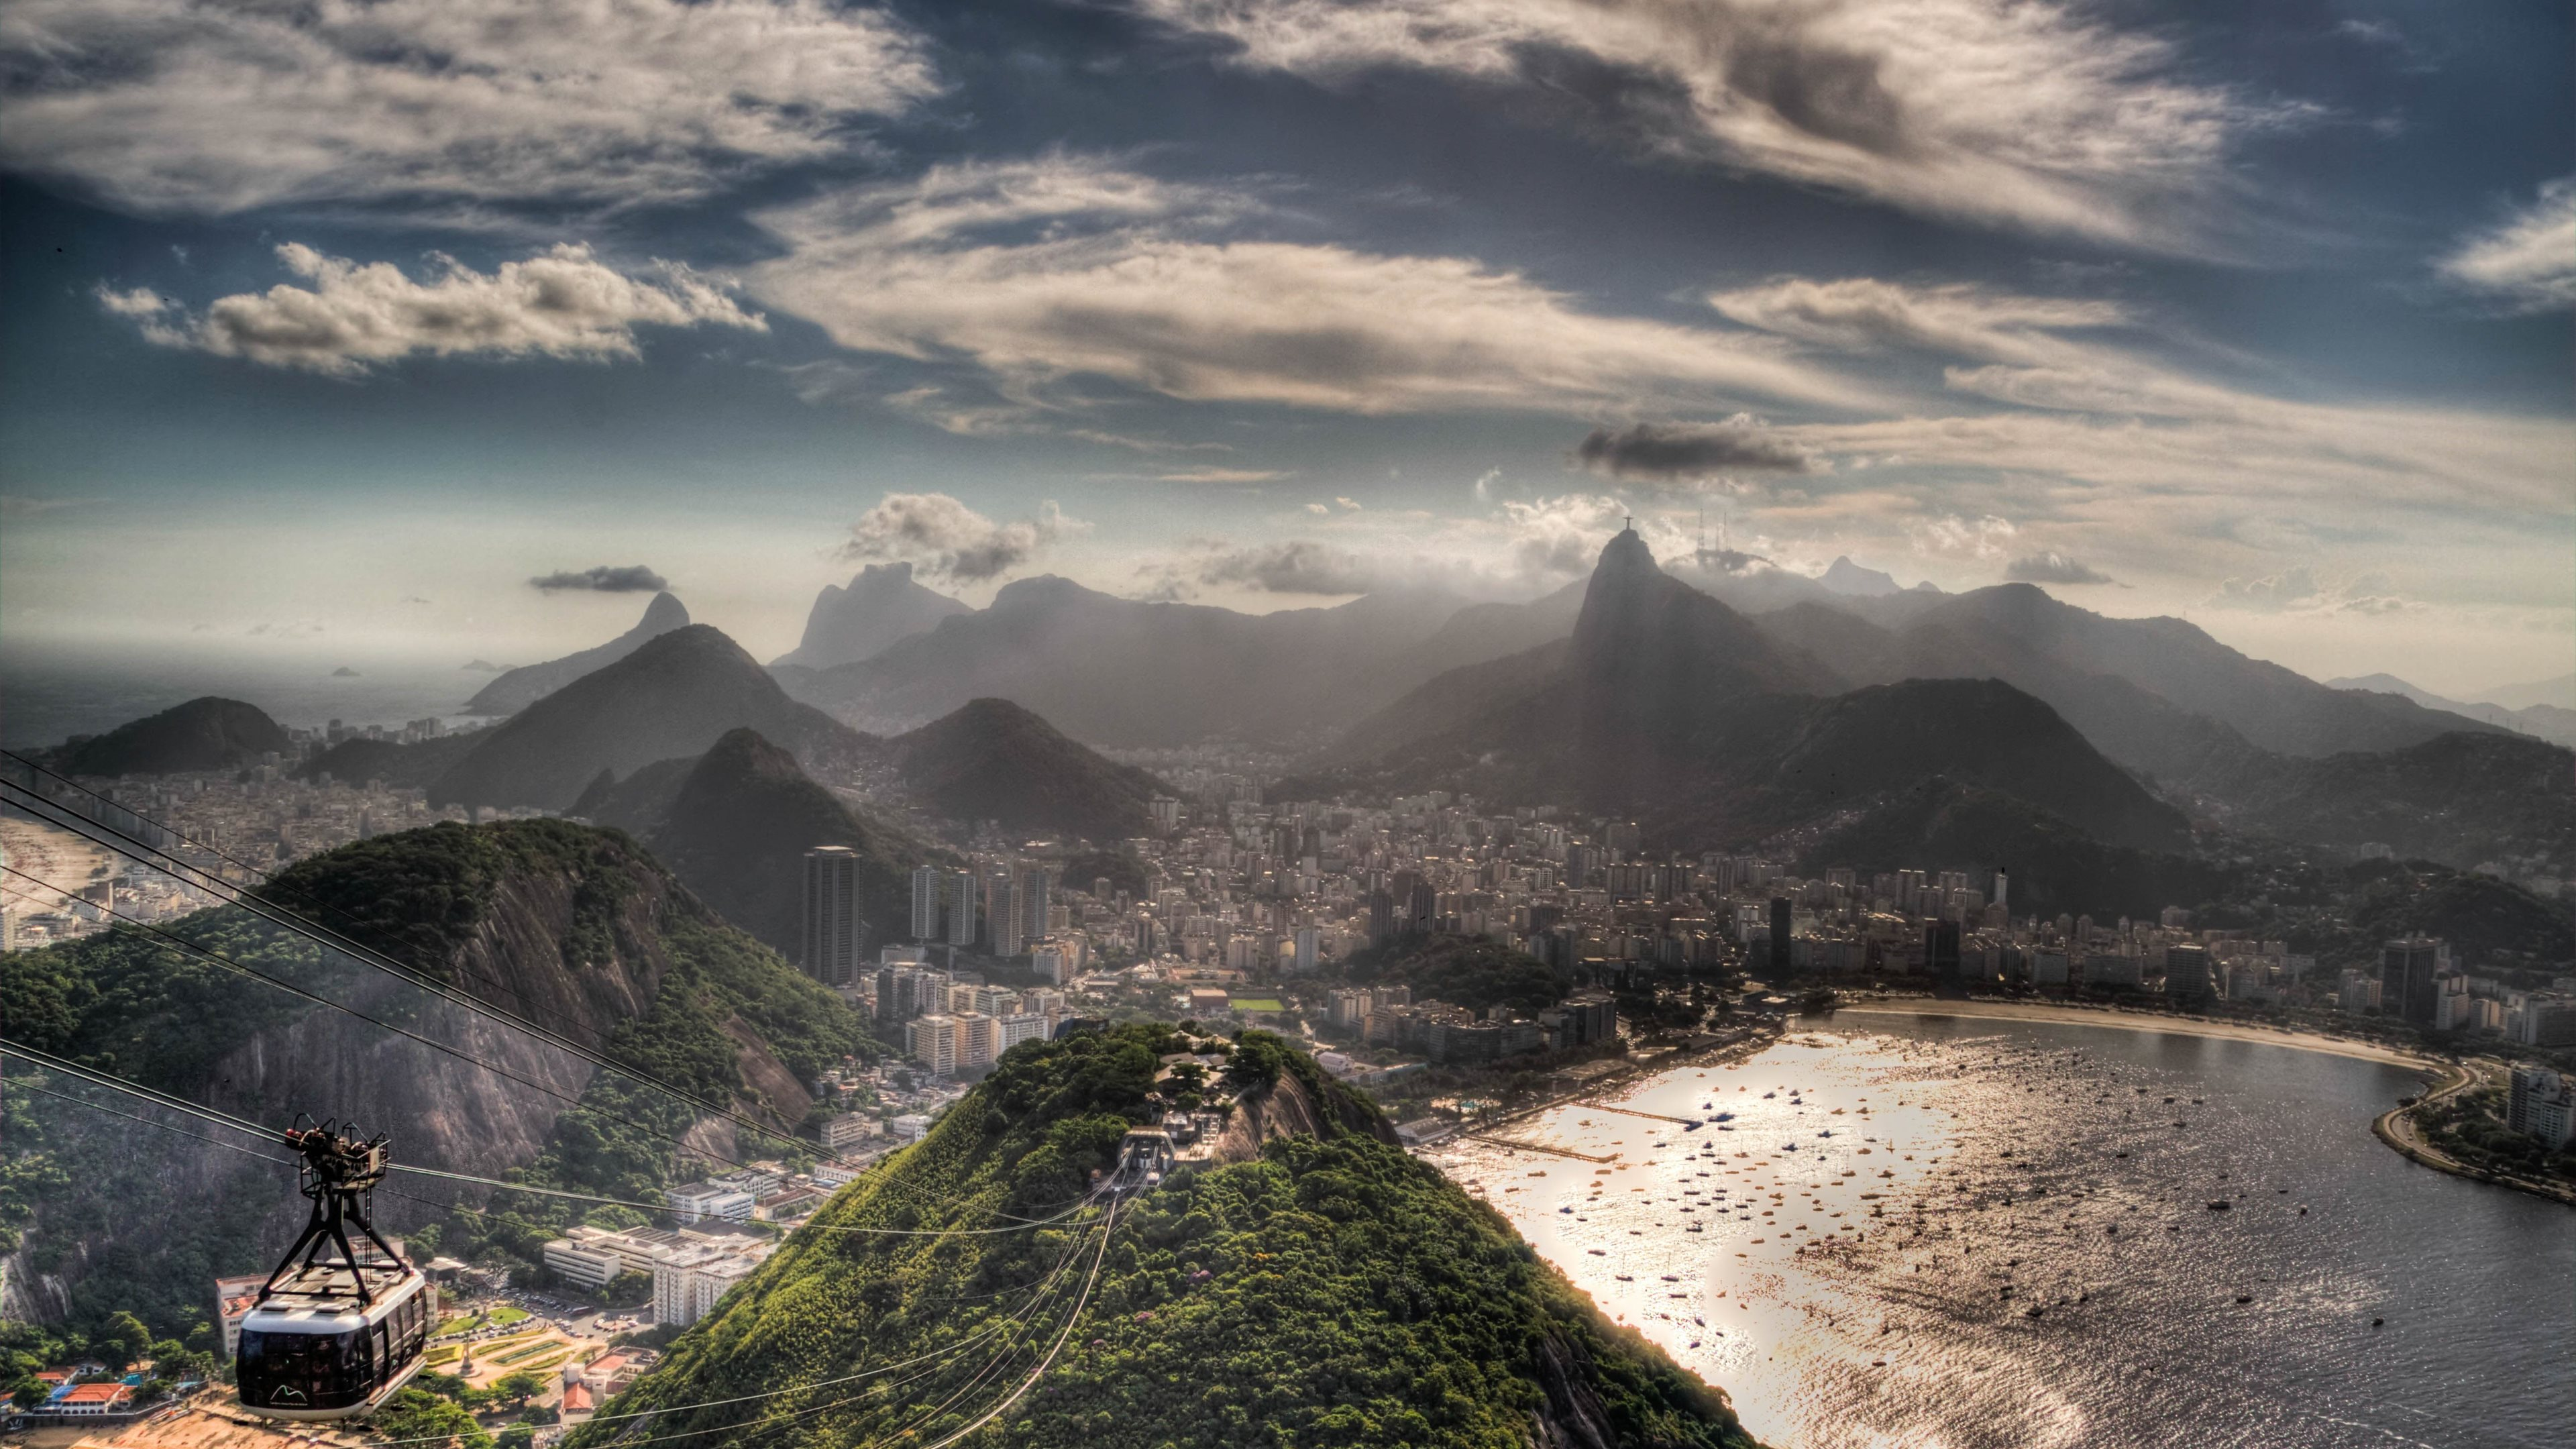 Man Made   Rio De Janeiro Wallpaper 3840x2160